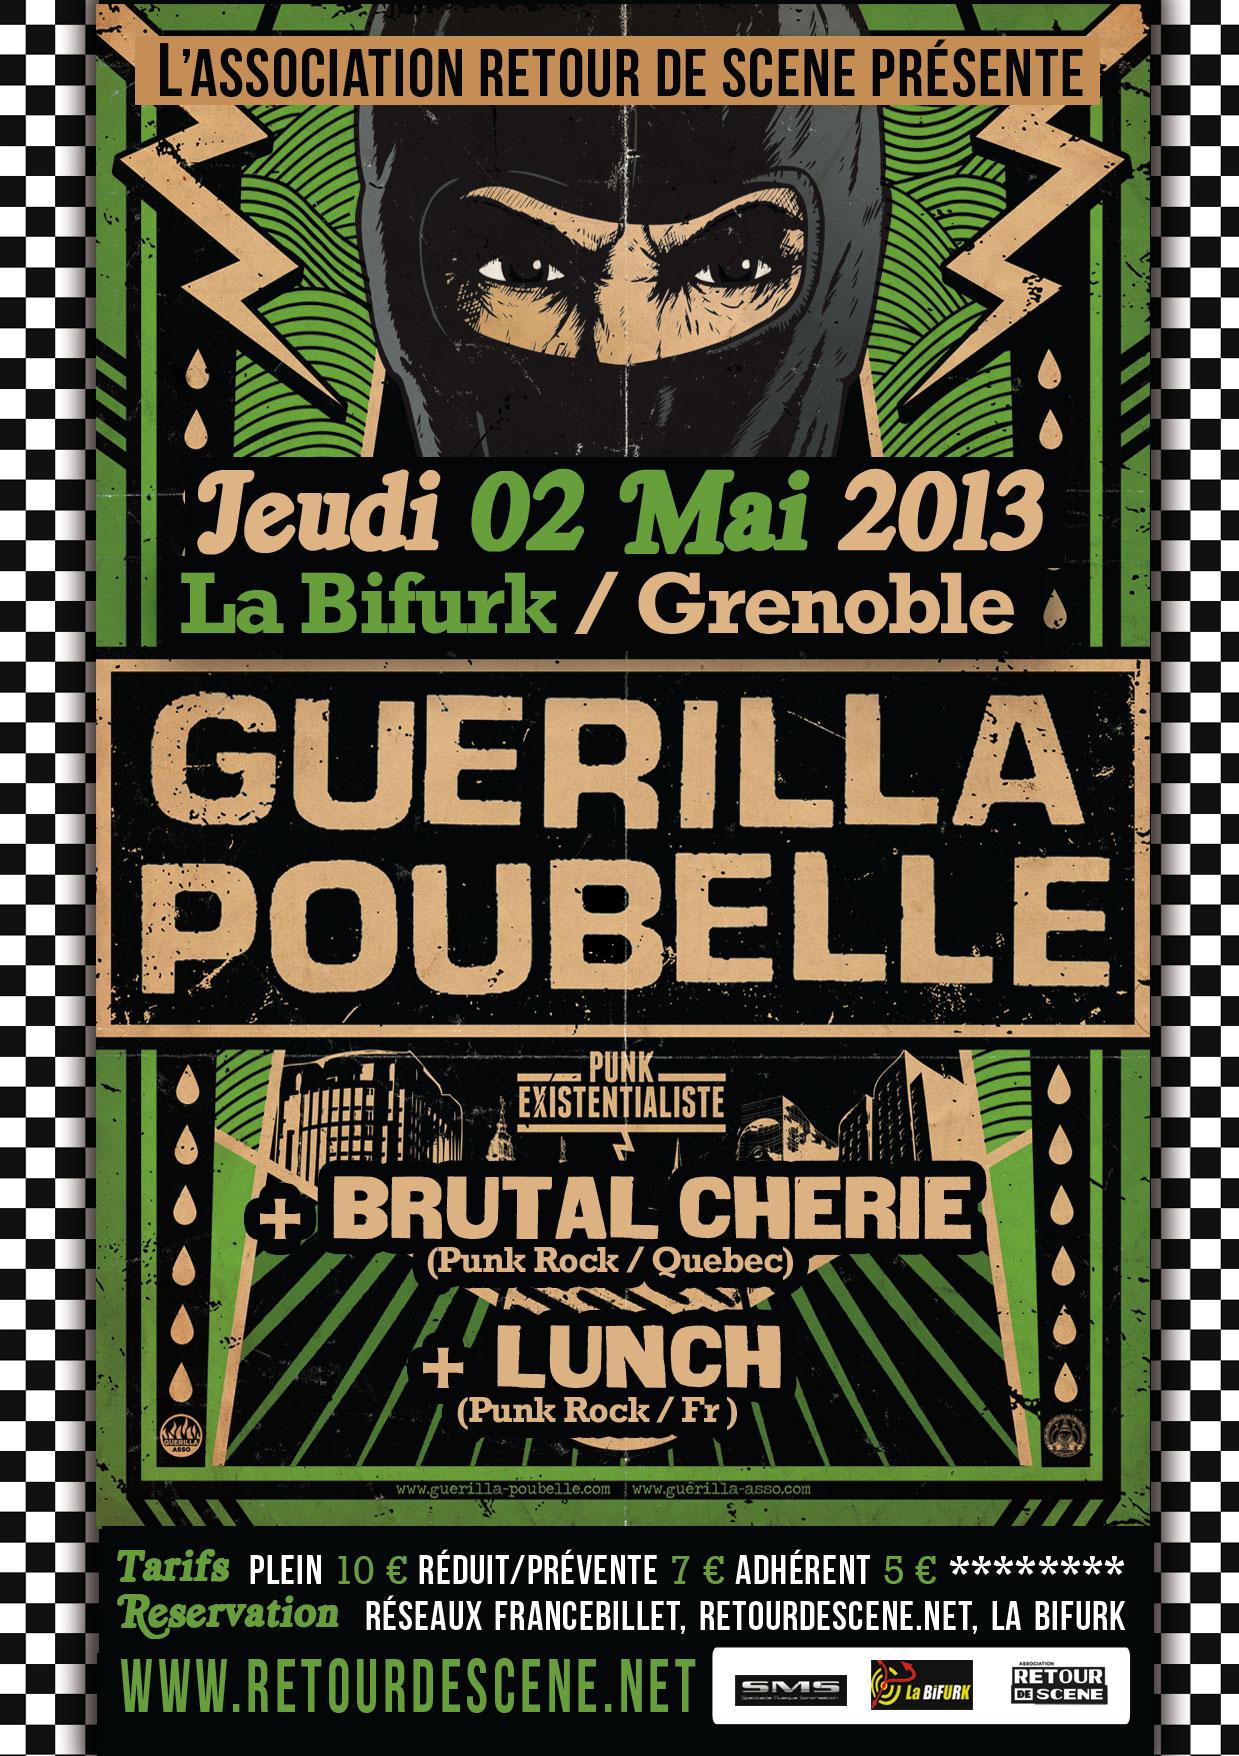 Guerilla Poubelle - La Bifurk - 02/05/2013